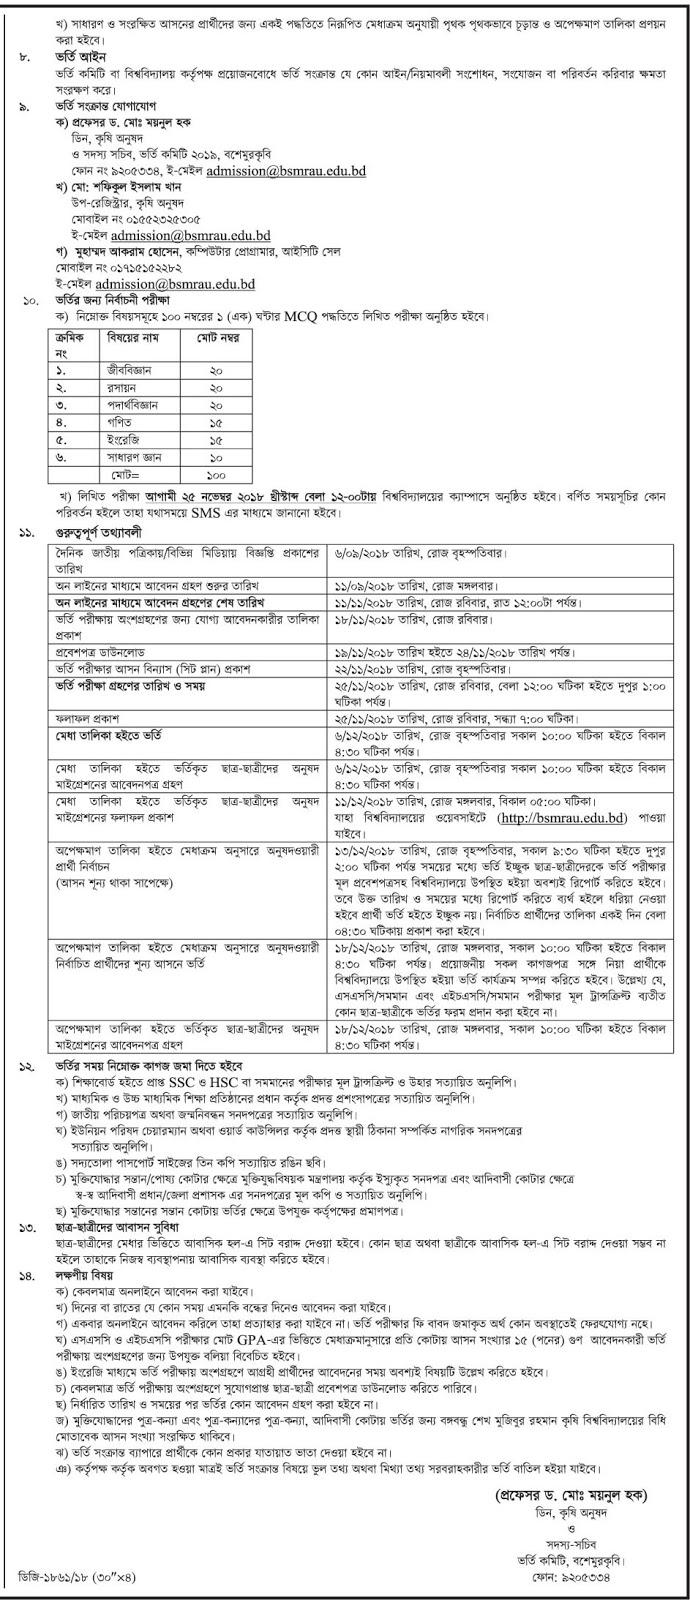 Bangabandhu Sheikh Mujibur Rahman Agricultural University (BSMRAU) Admission circular 2018-2019